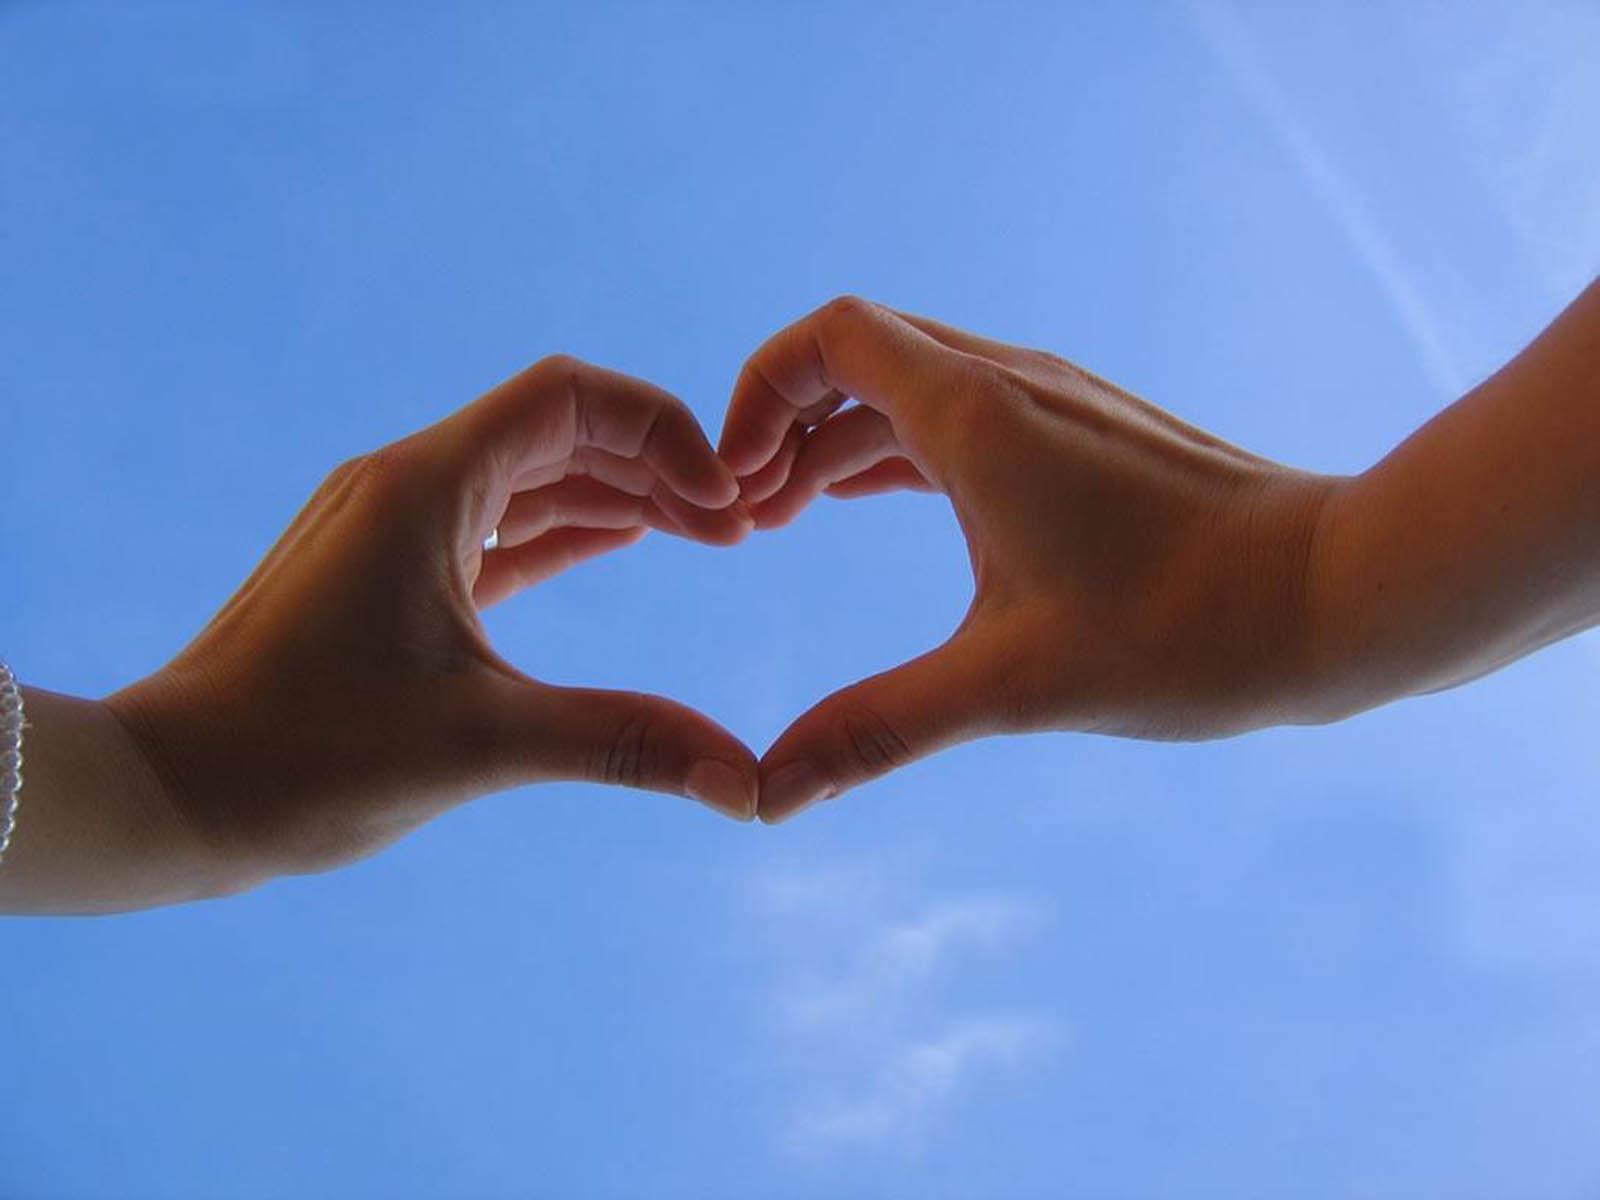 Girl Boy Love Heart Hand Wallpapers HD New HD Wallpapers ...  Hand Cut Love Wallpaper